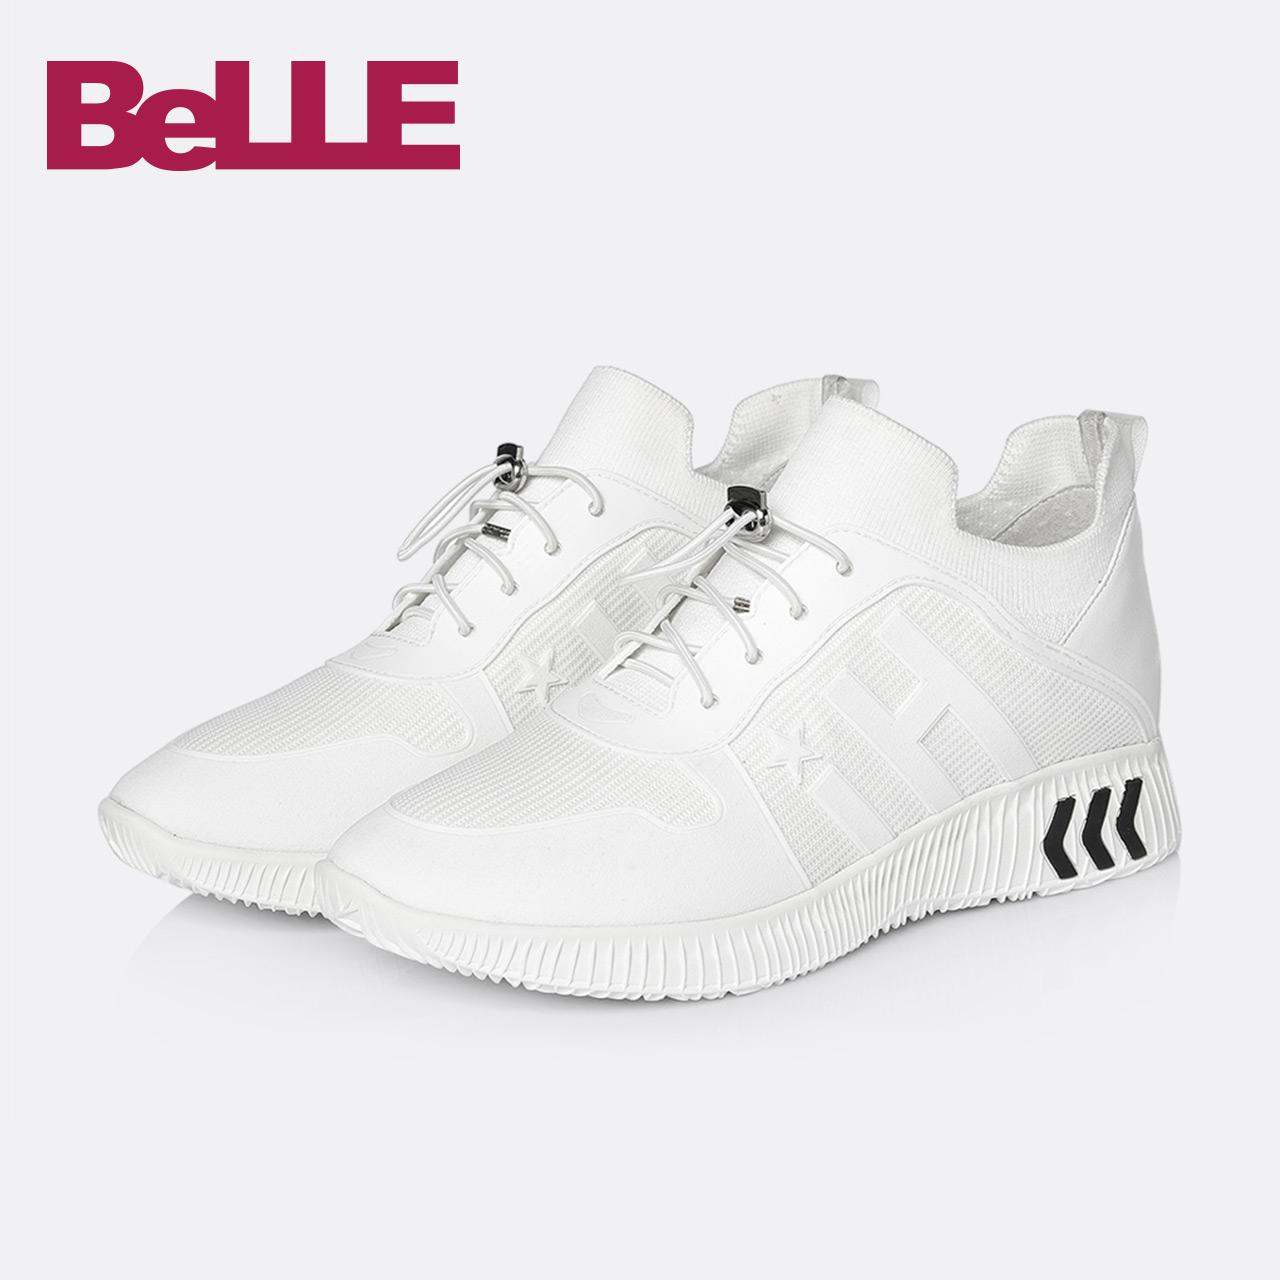 Belle-百丽小白鞋2018春新款商场运动透气休闲女单鞋S2C1DAM8